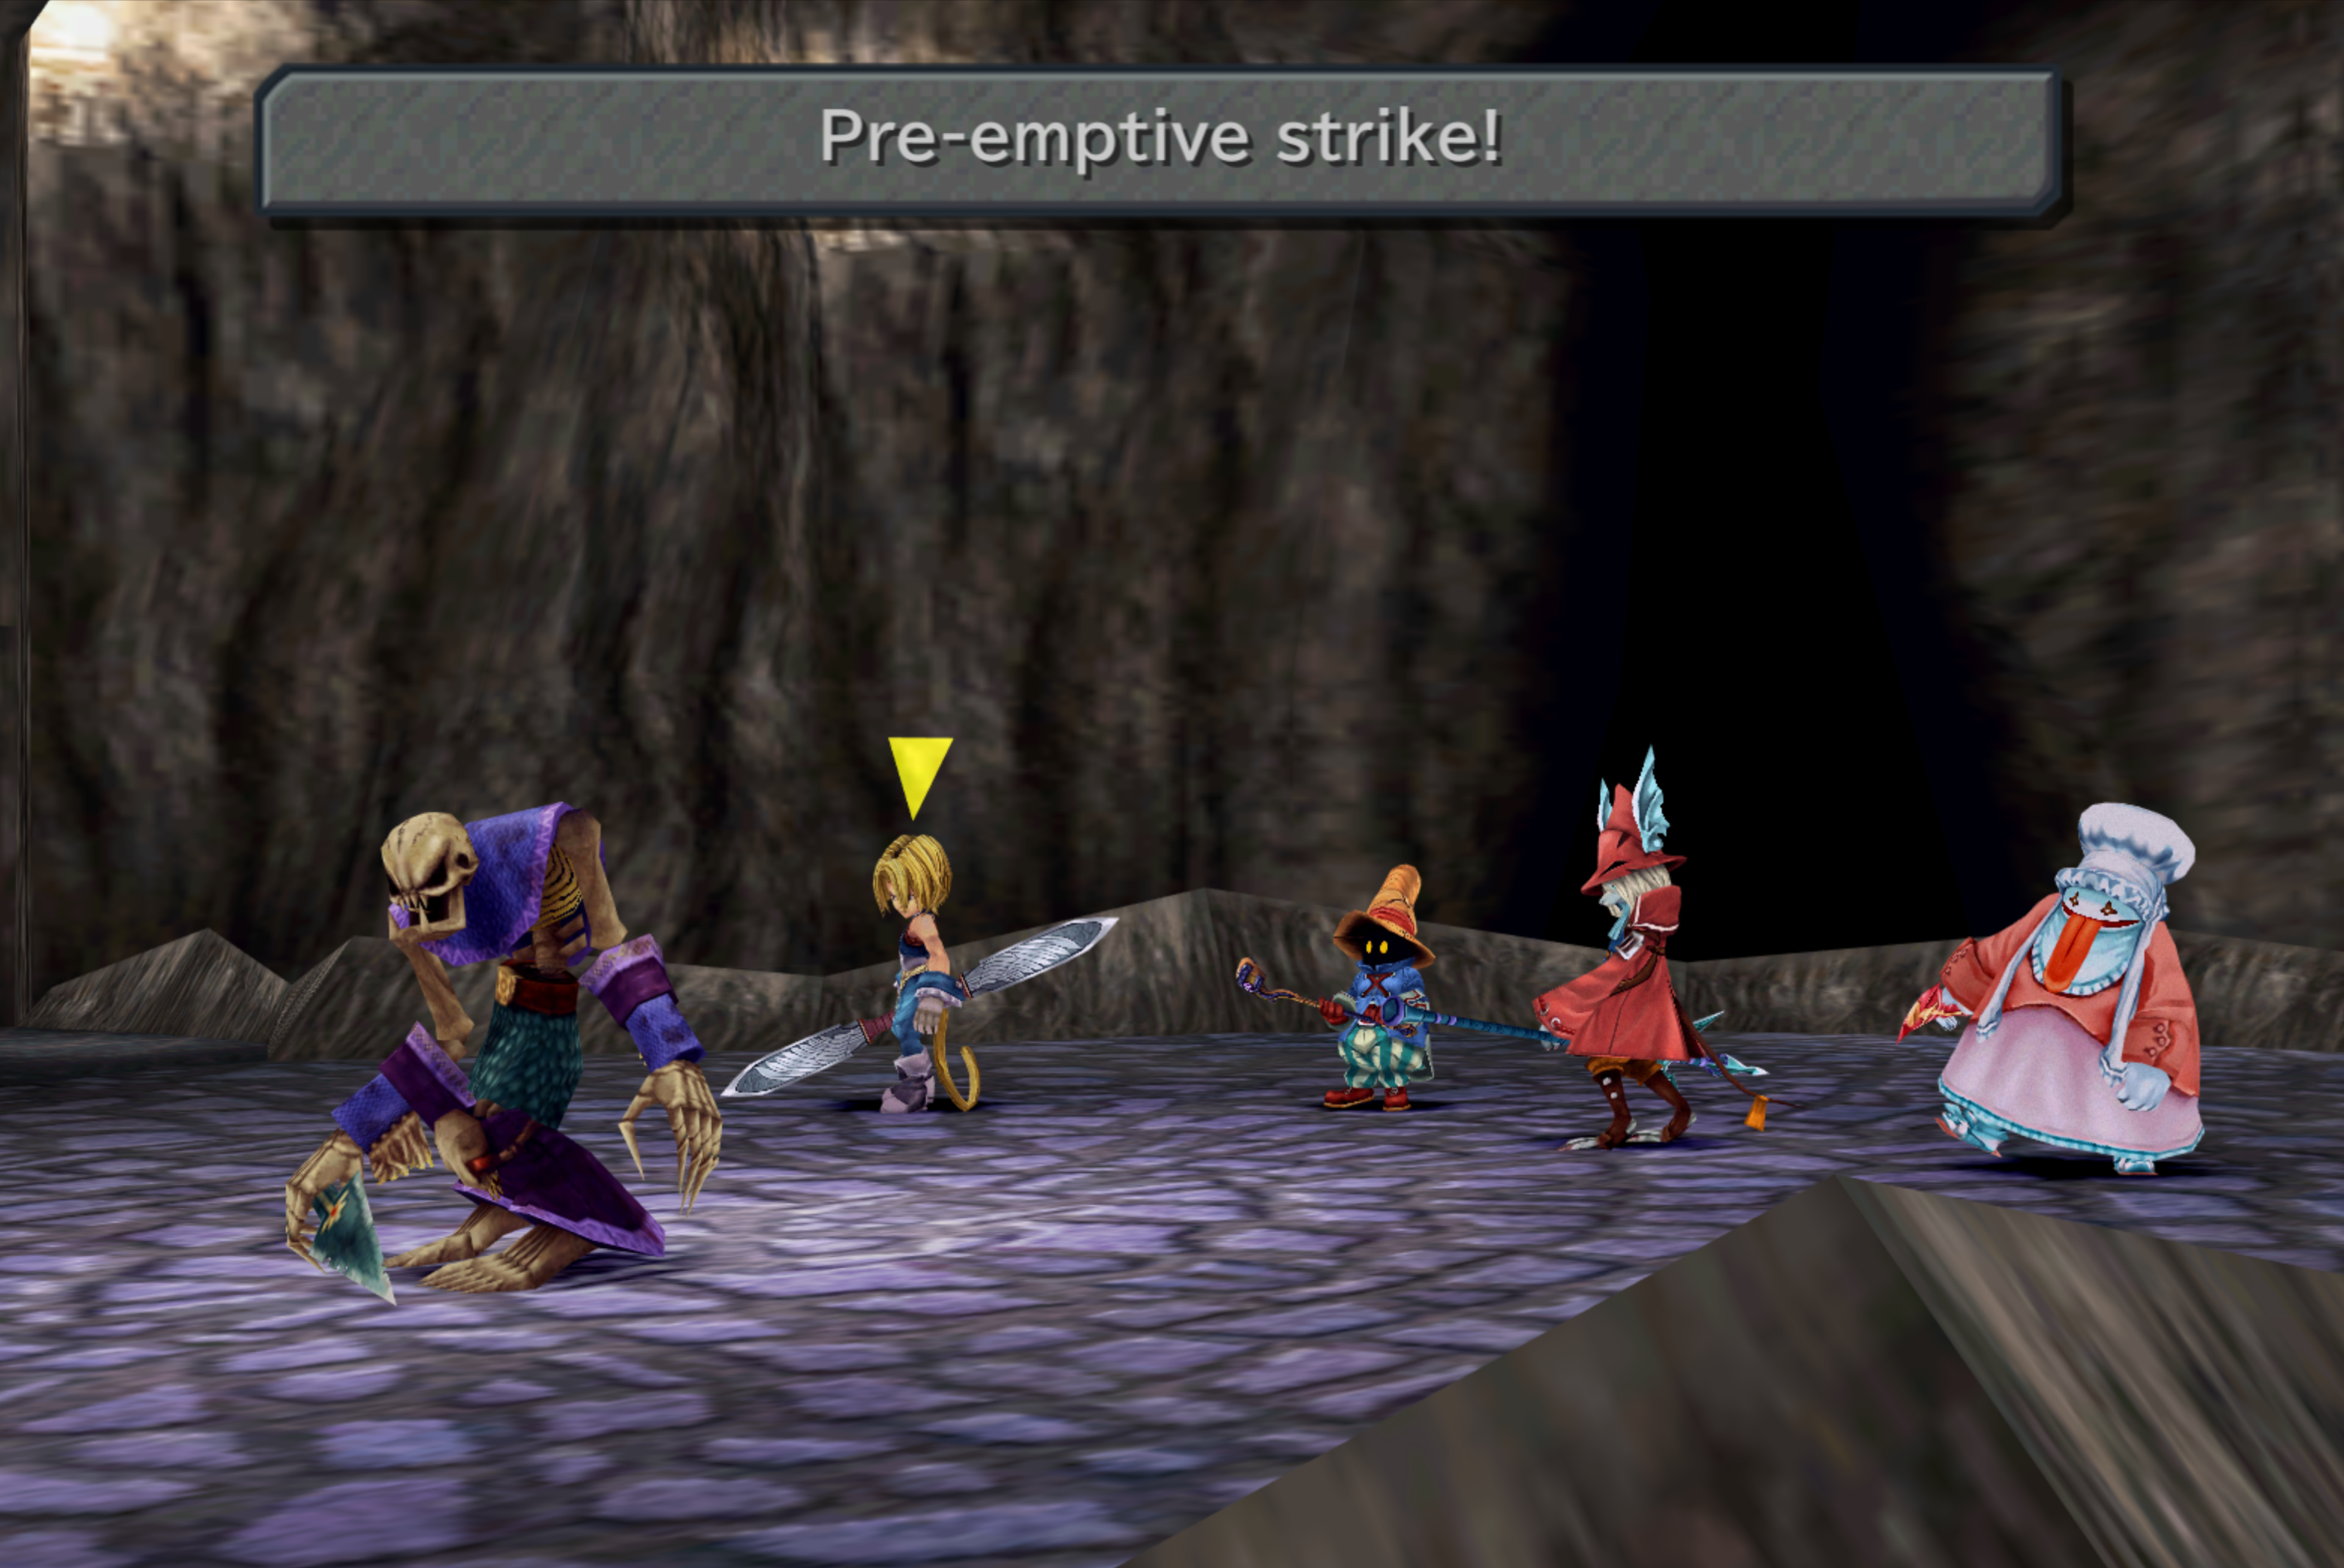 File:FFIX Preemptive Strike.png